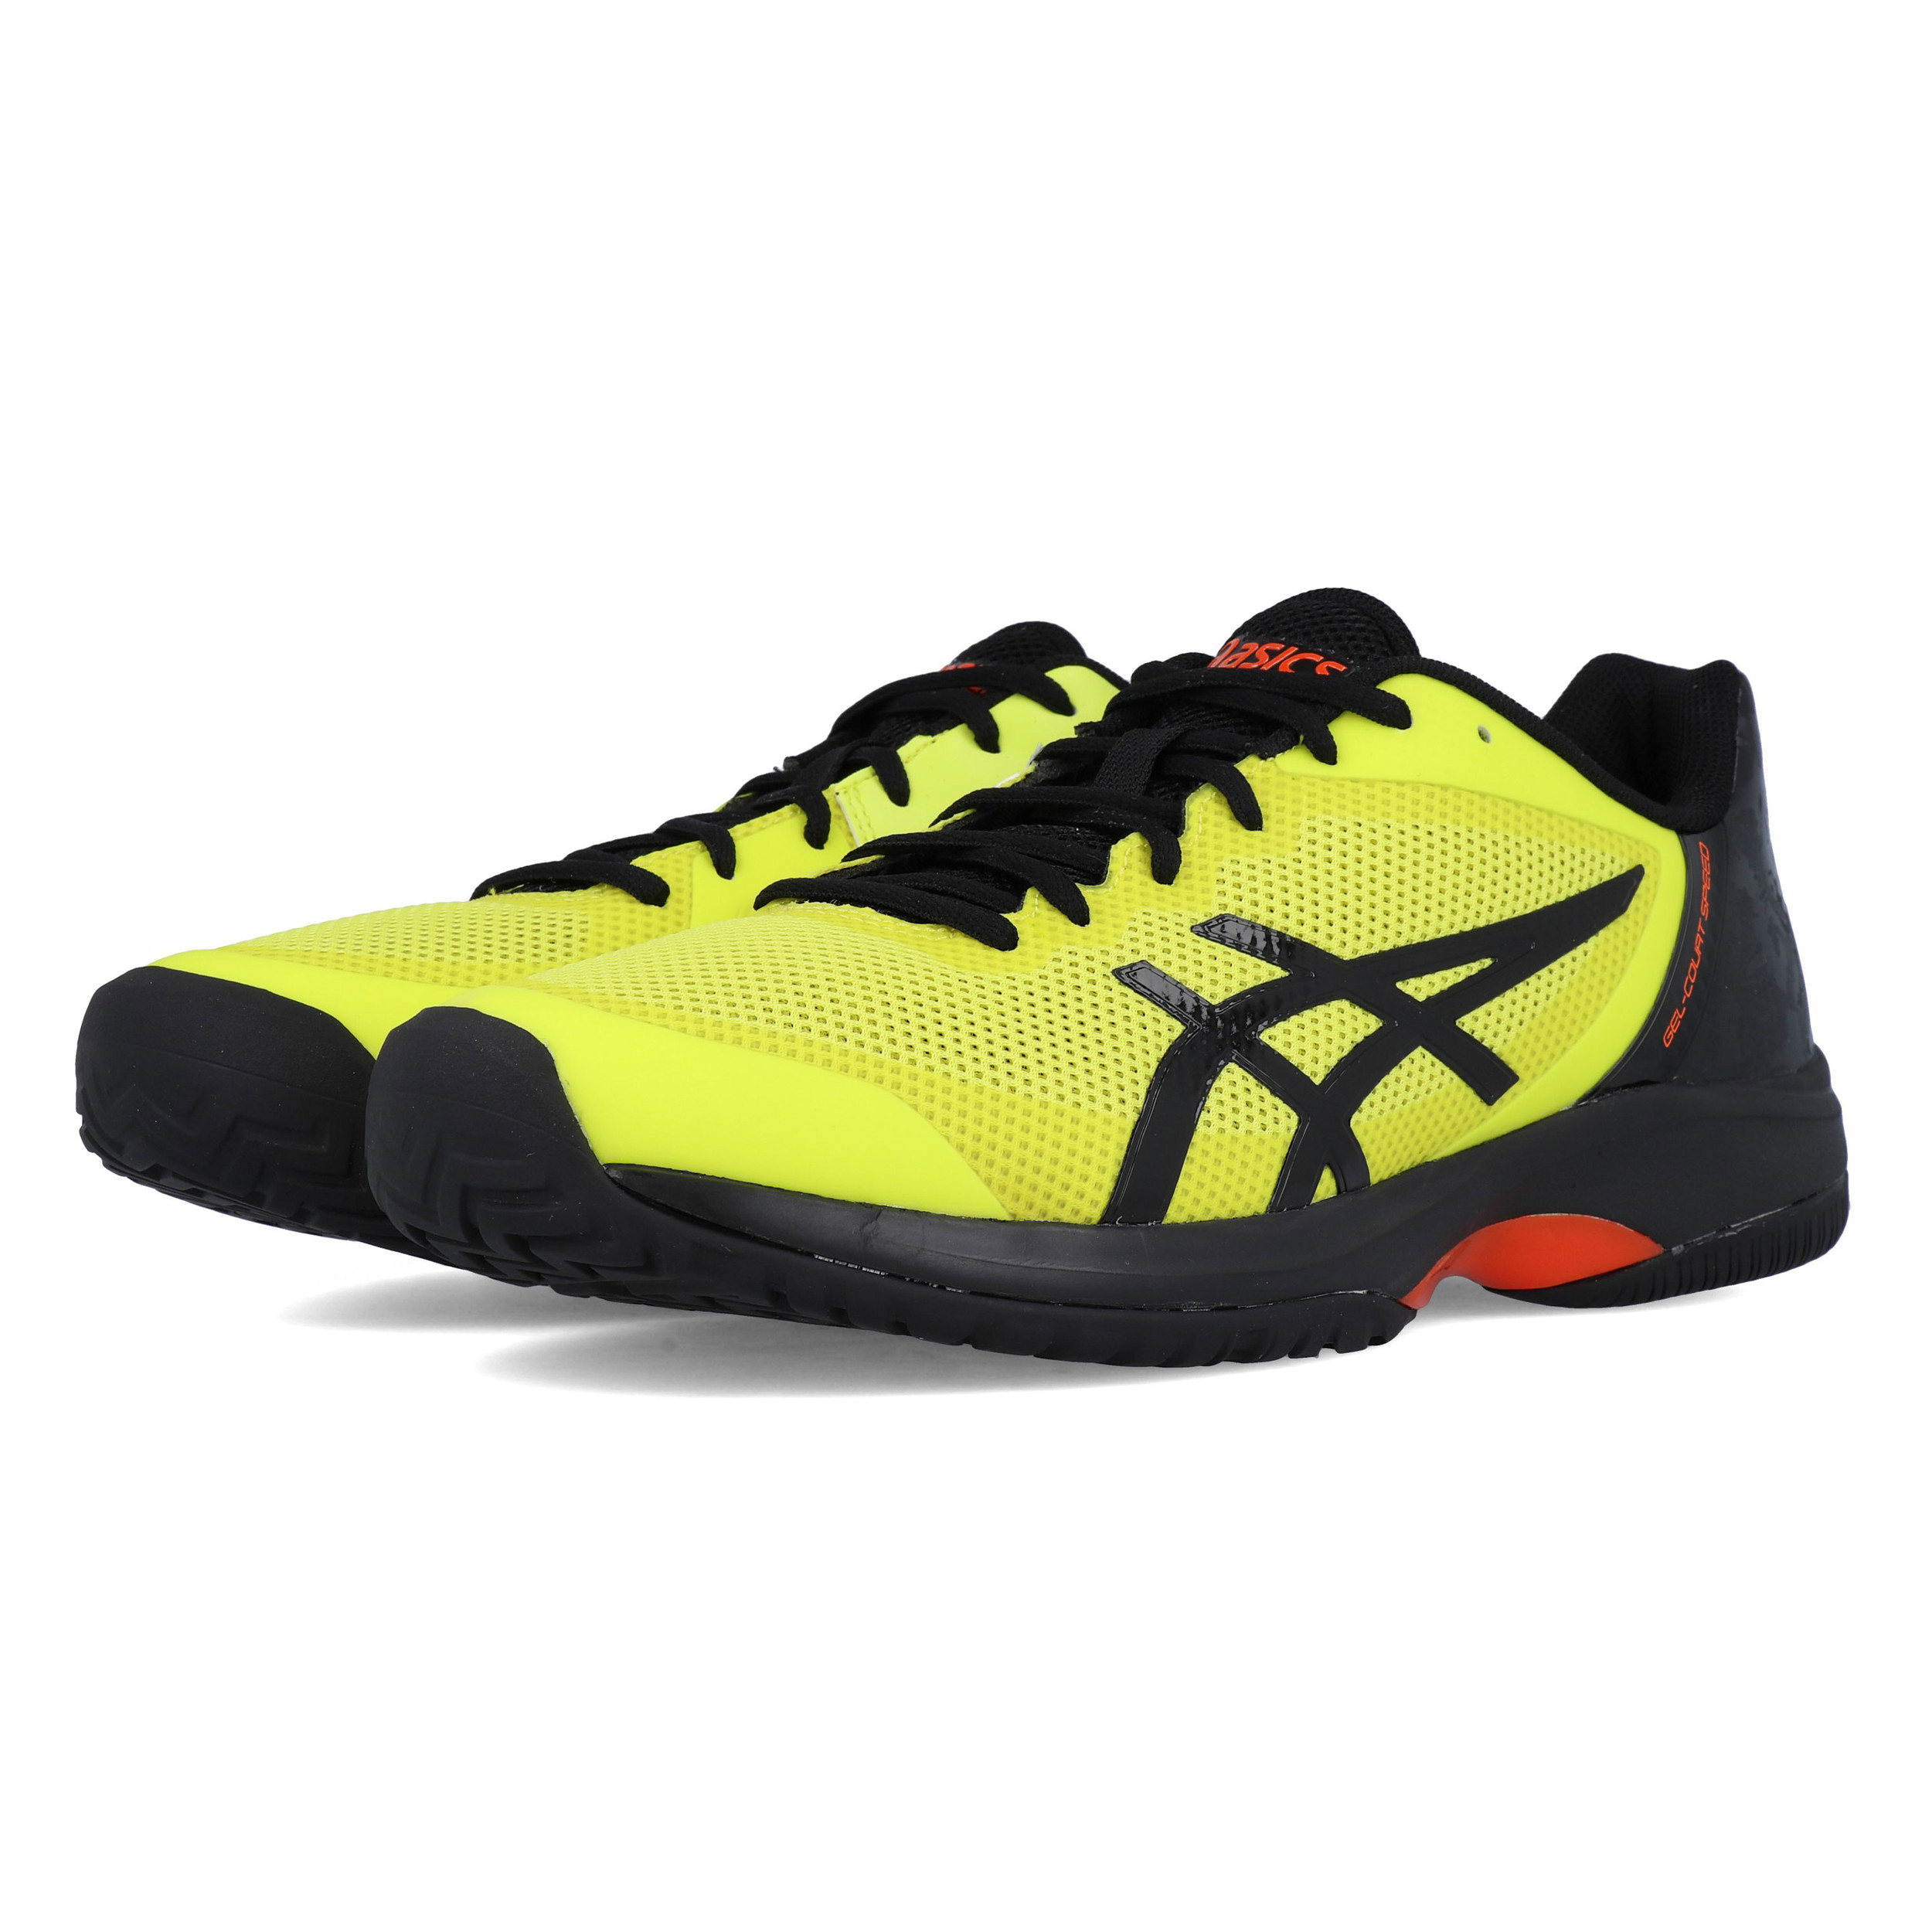 Asics Mens Gel-Court Speed Tennis Shoes